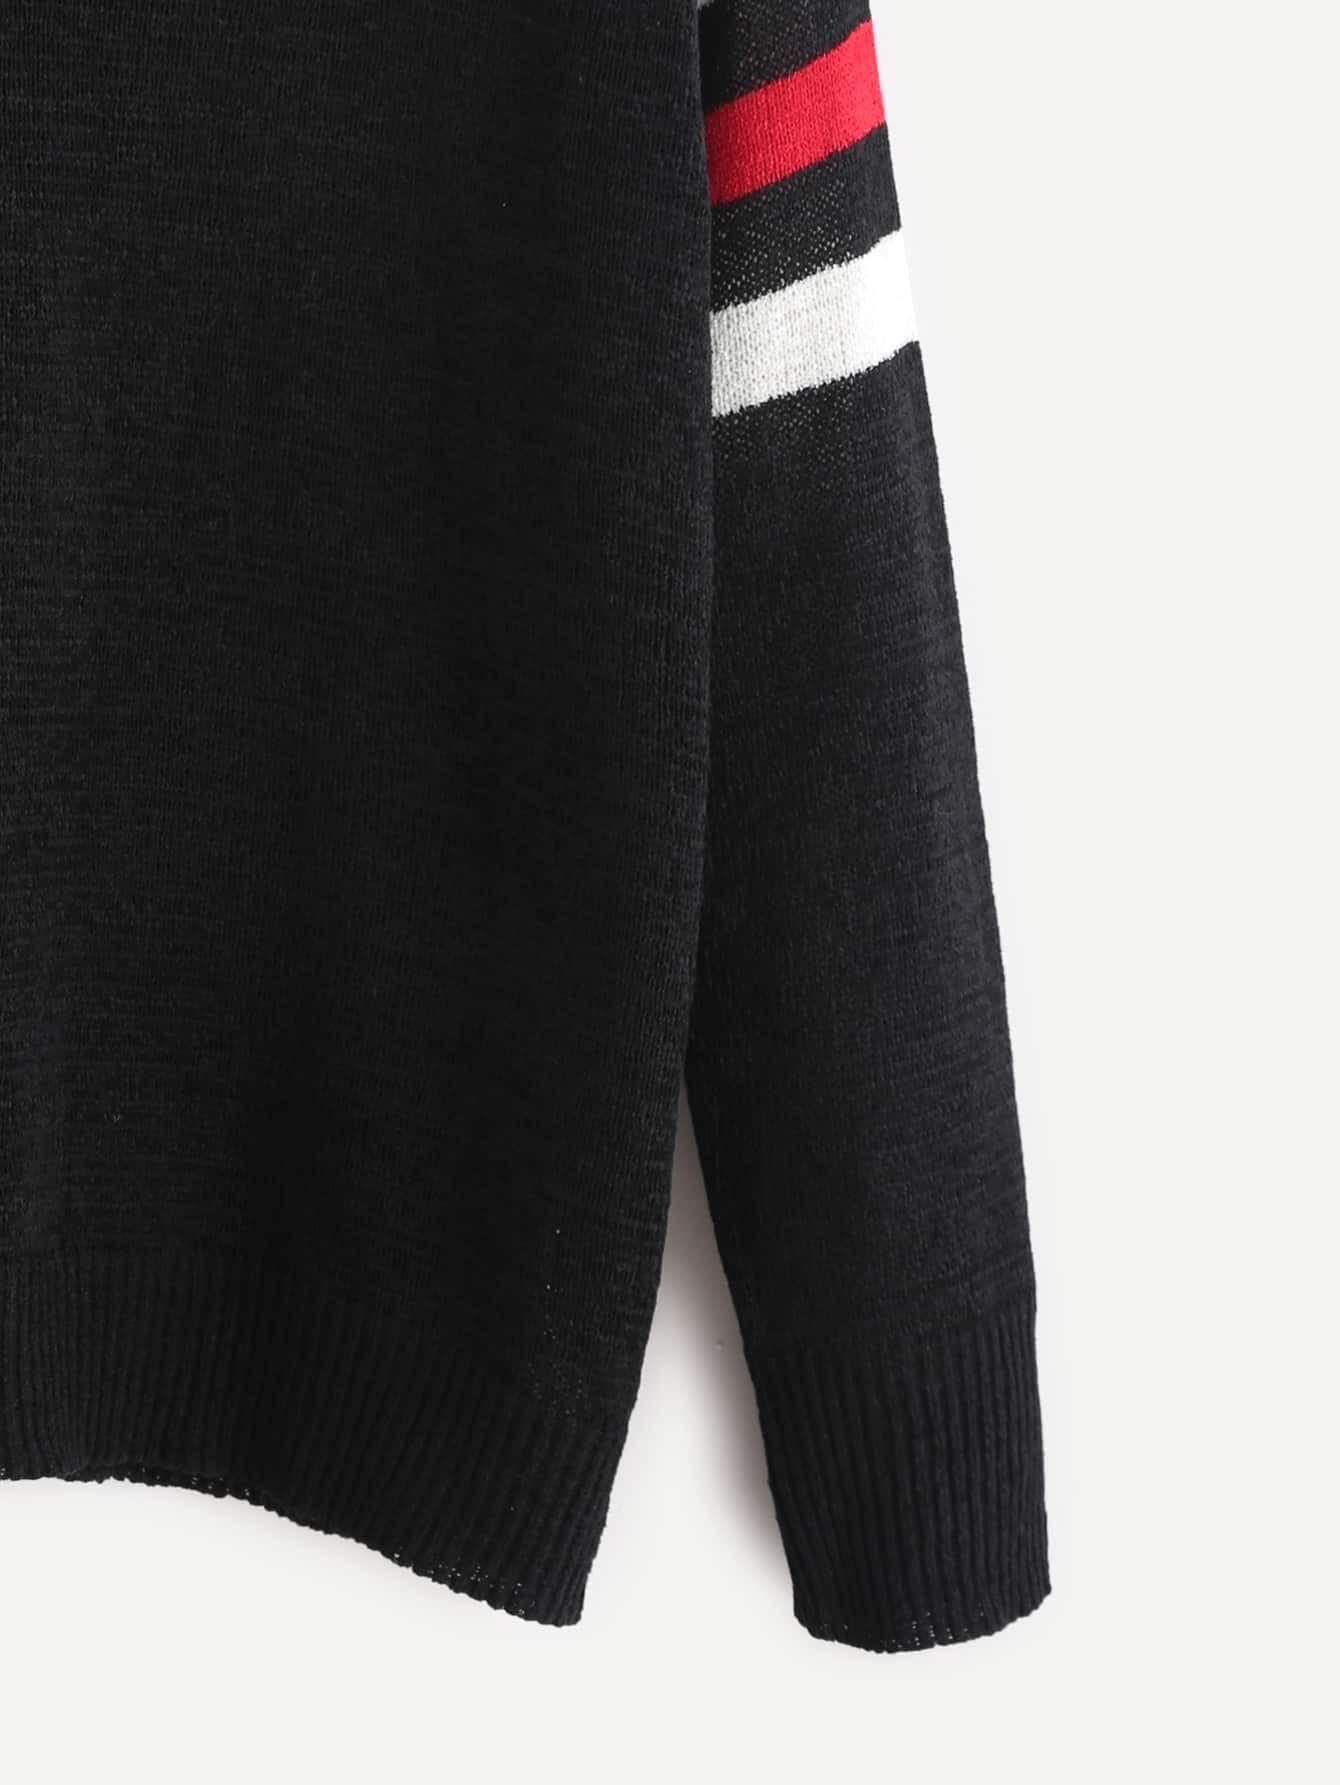 sweater161020471_2